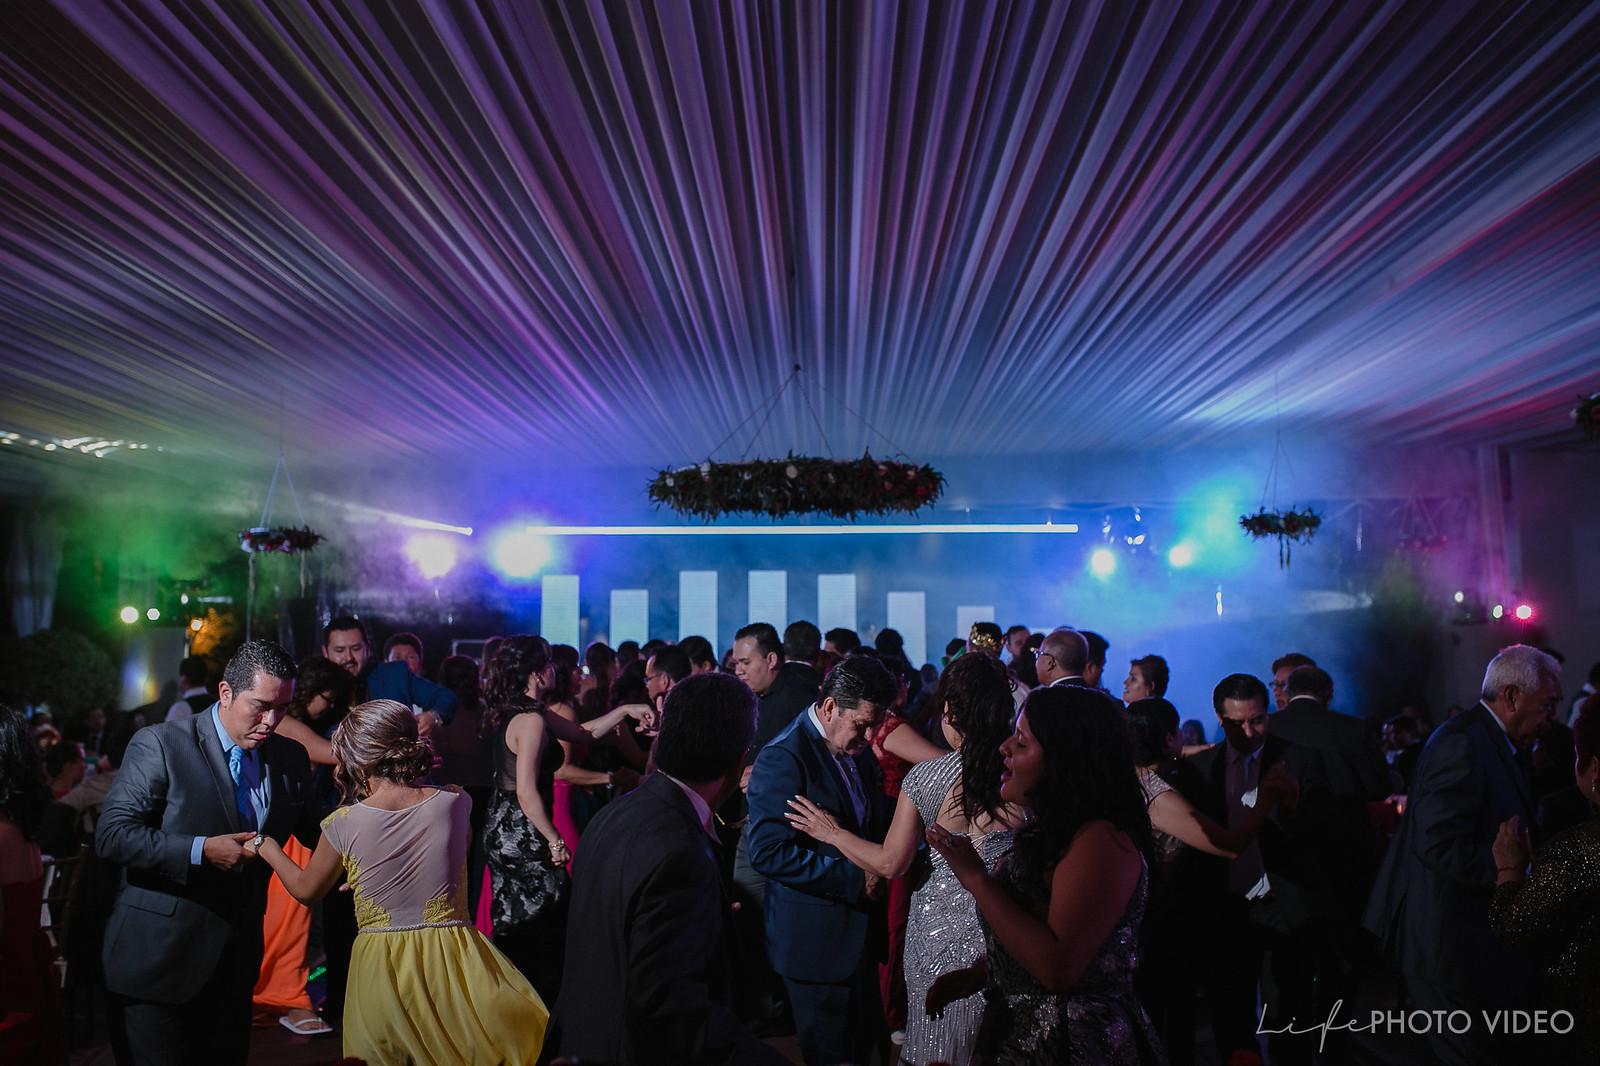 Boda_Irapuato_Guanajuato_Wedding_LifePhotoVideo